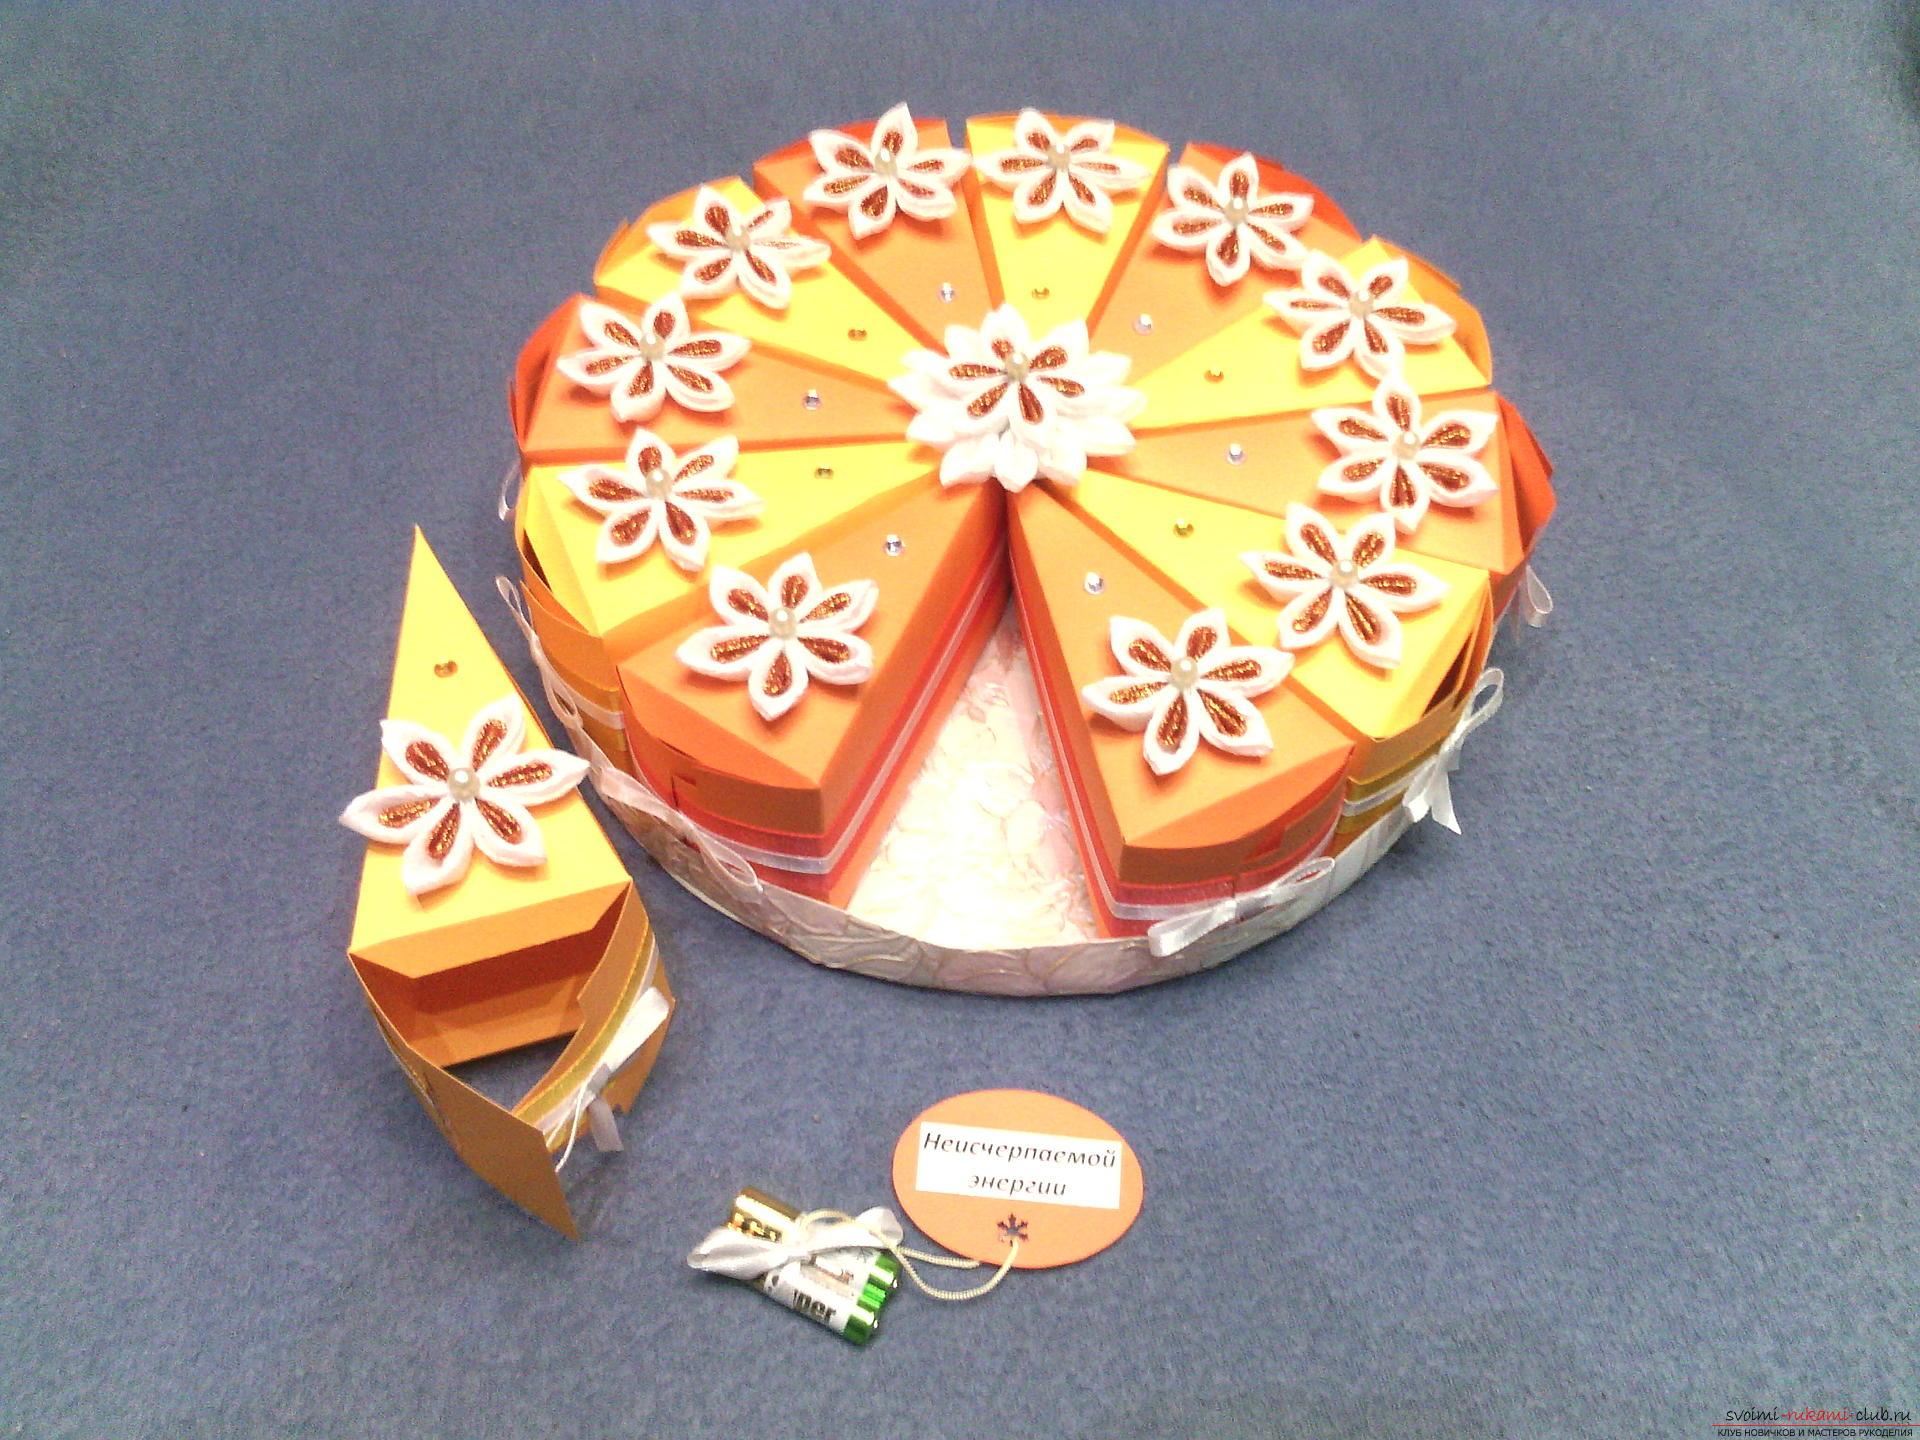 Тортик с пожеланиями своими руками фото 426